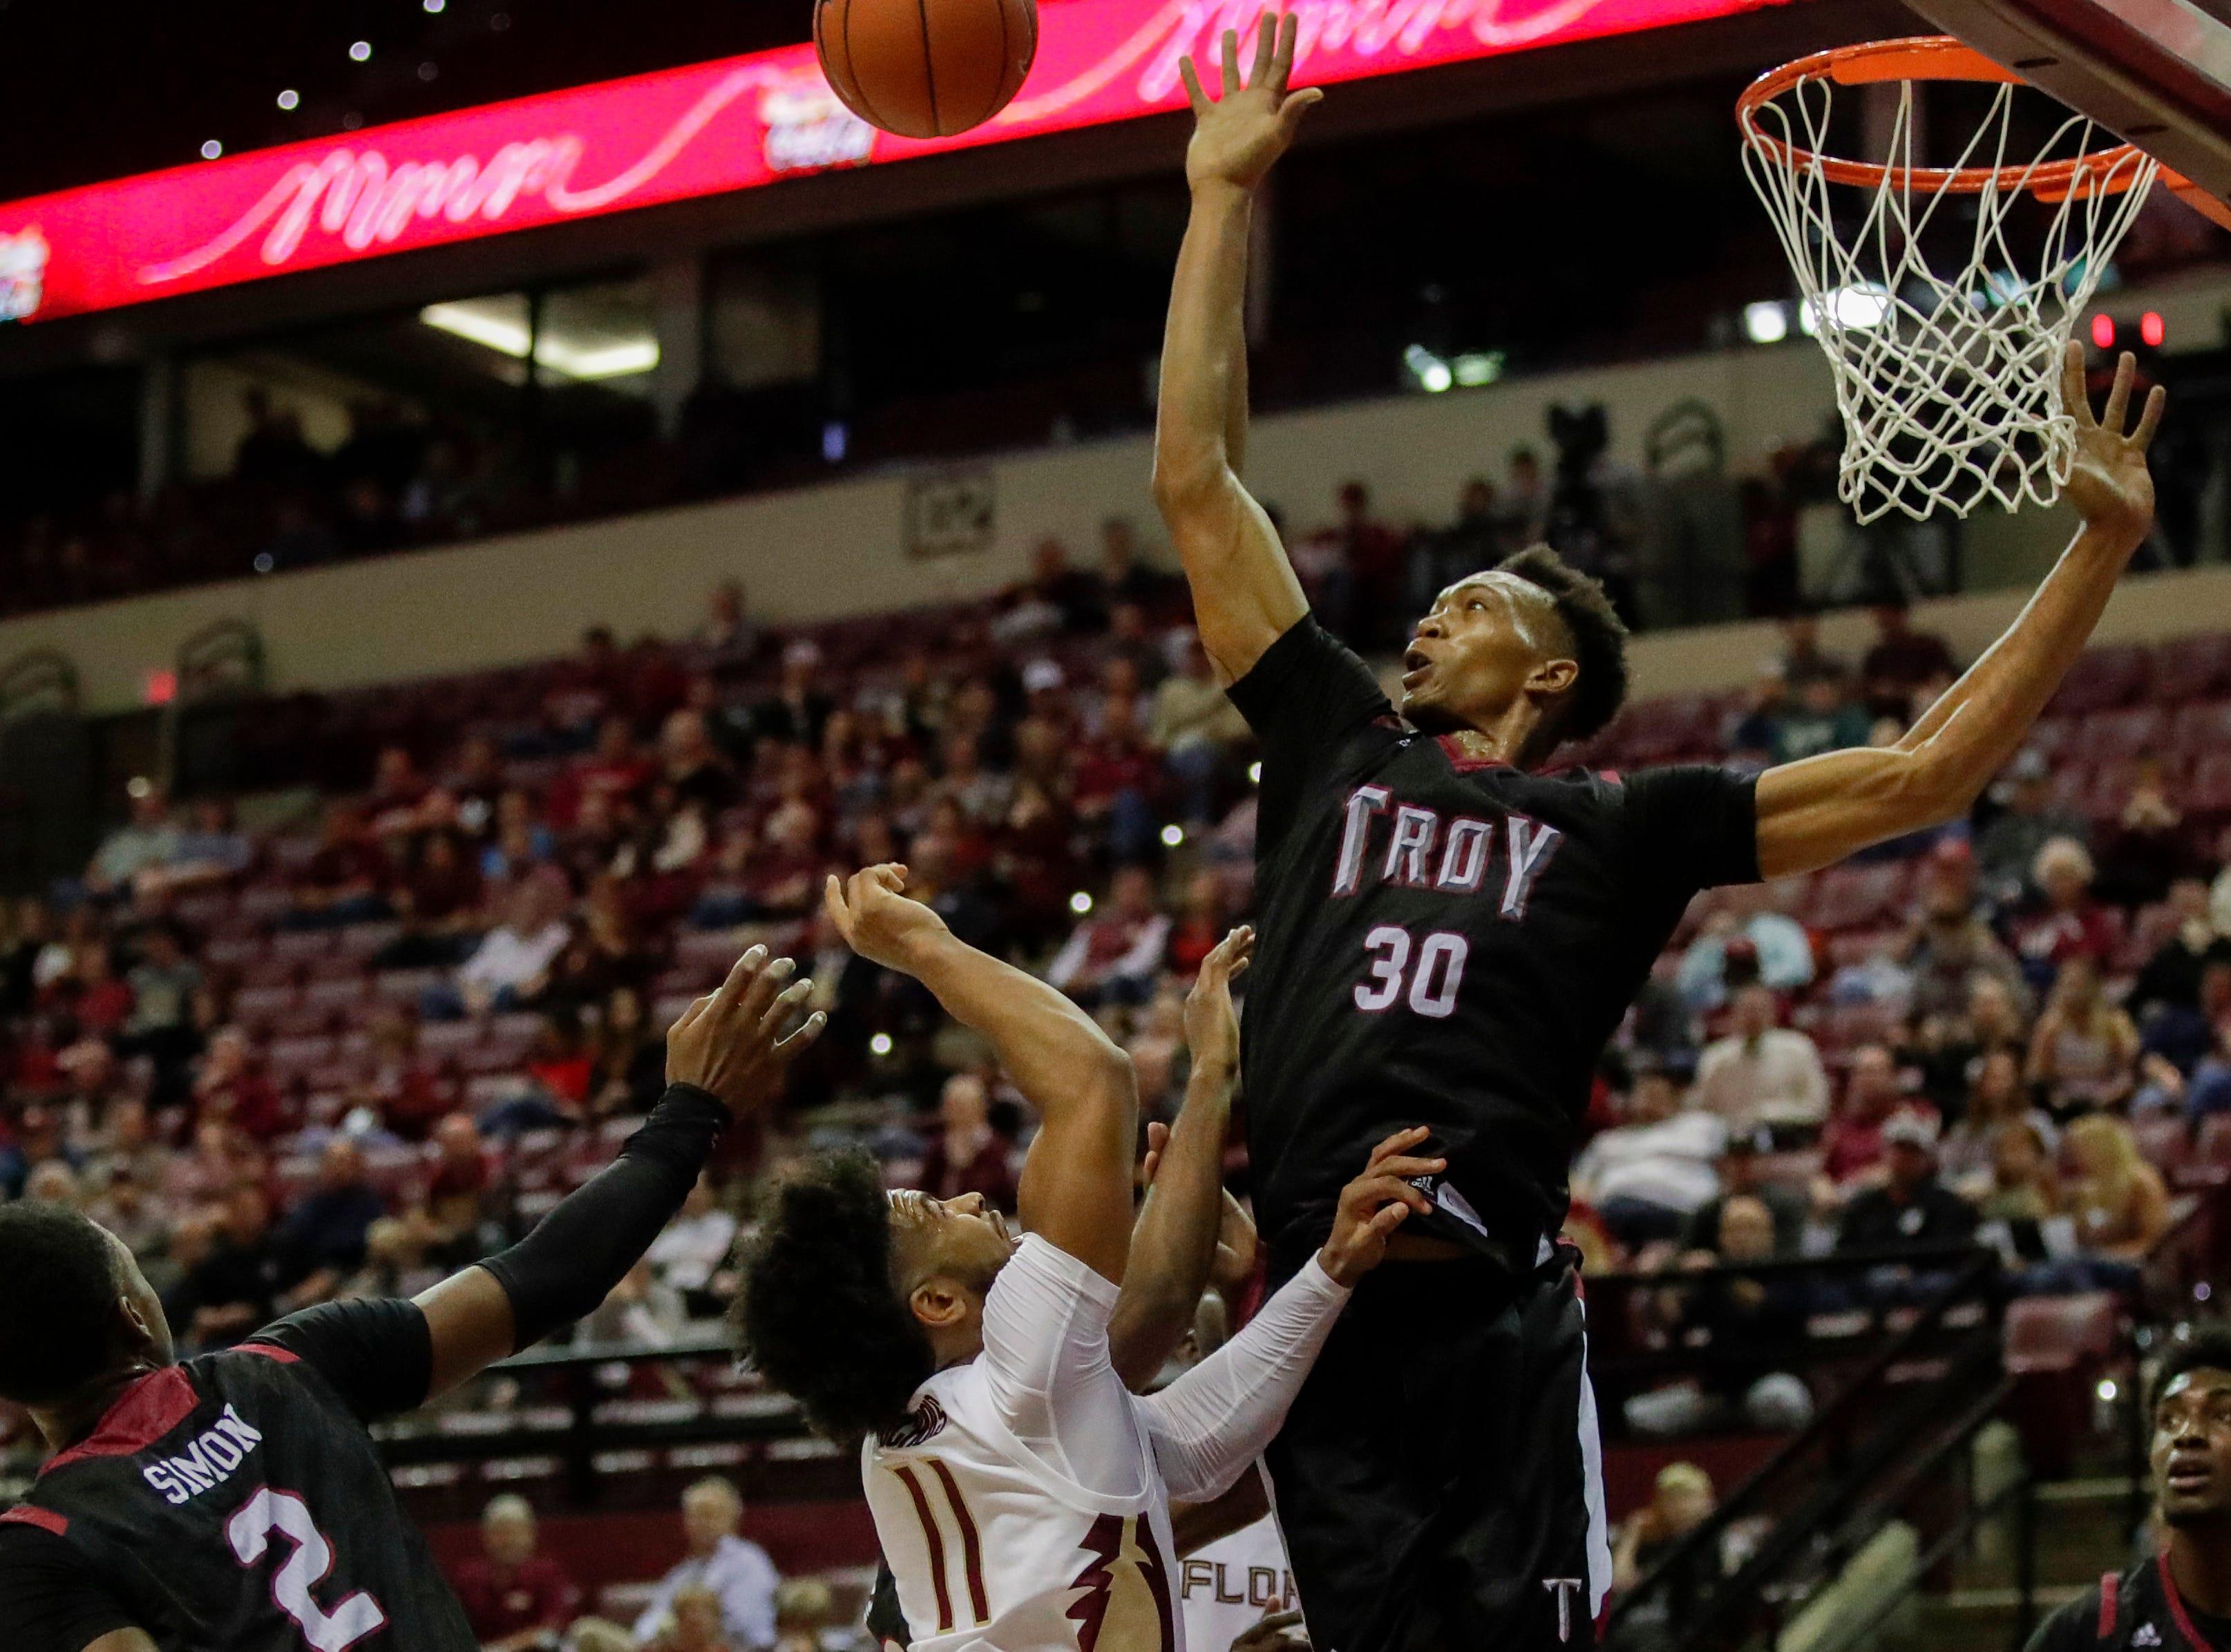 Troy Trojans forward Alex Hicks (30) blocks the shot of Florida State Seminoles guard David Nichols (11) during a game between FSU and Troy University at Donald L. Tucker Civic Center Monday, Dec. 3, 2018.